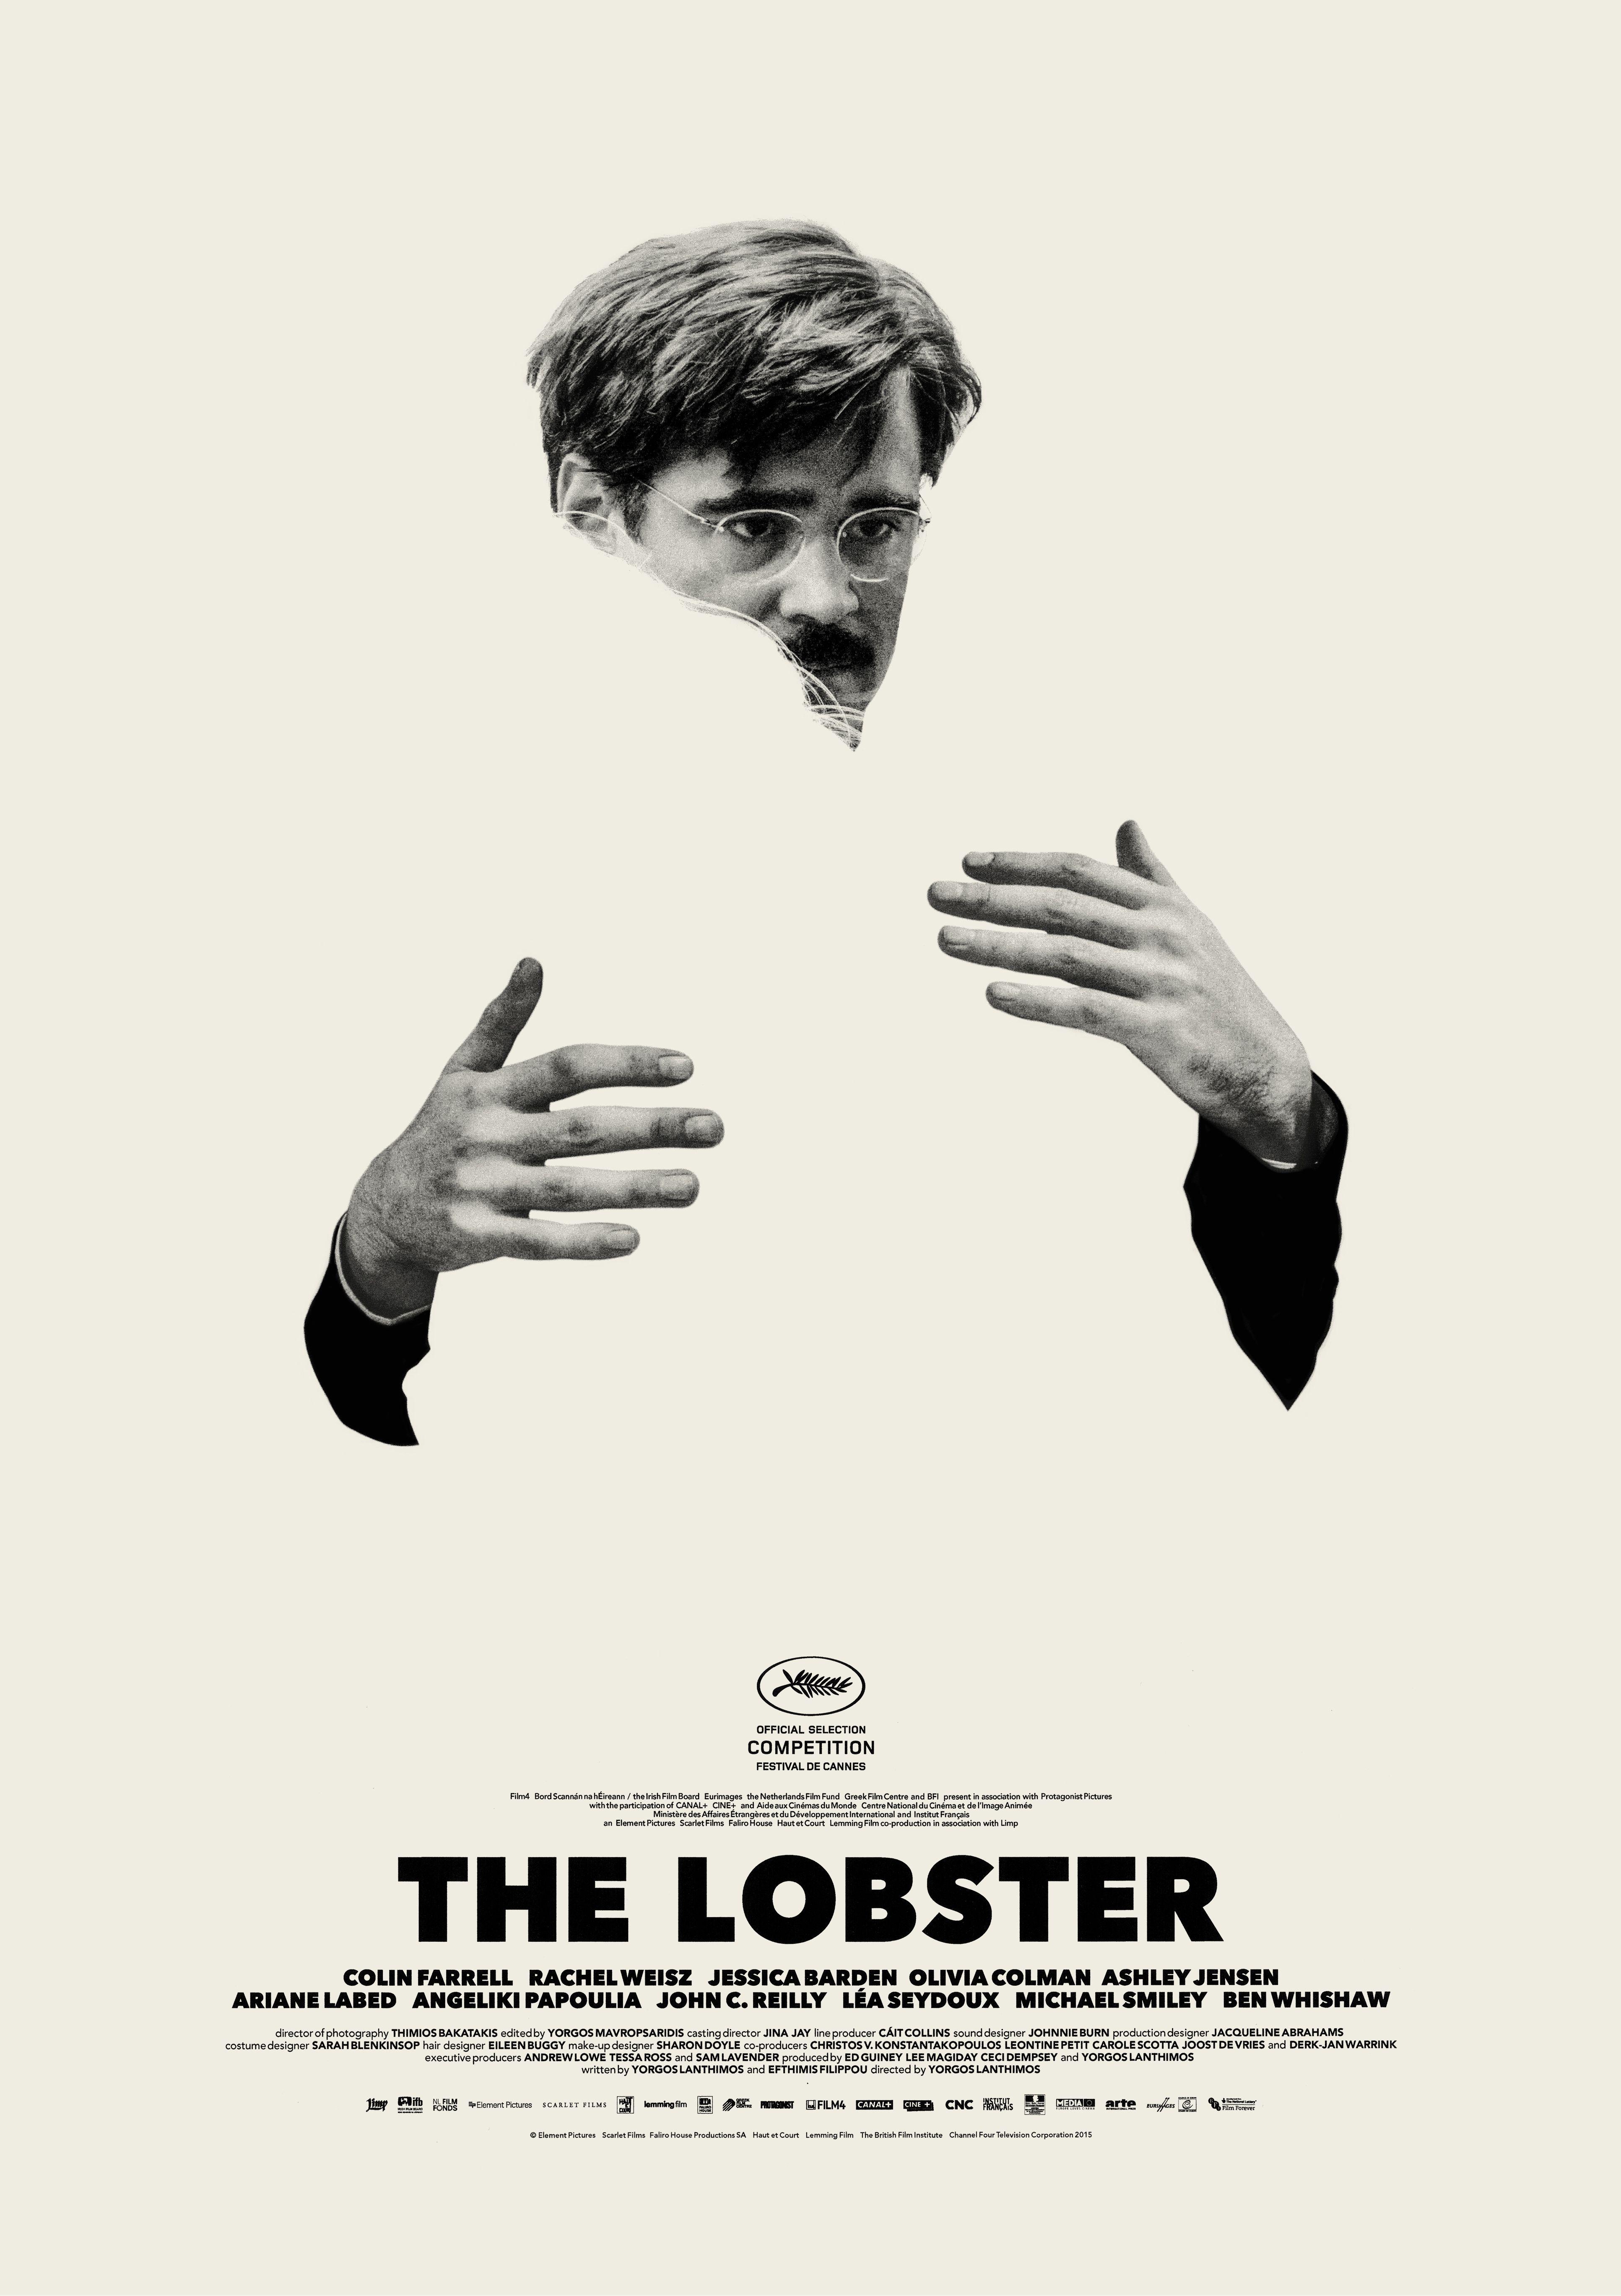 The Lobster — 2015 – Director: Yorgos Lanthimos / Writers: Yorgos Lanthimos, Efthymis Filippou